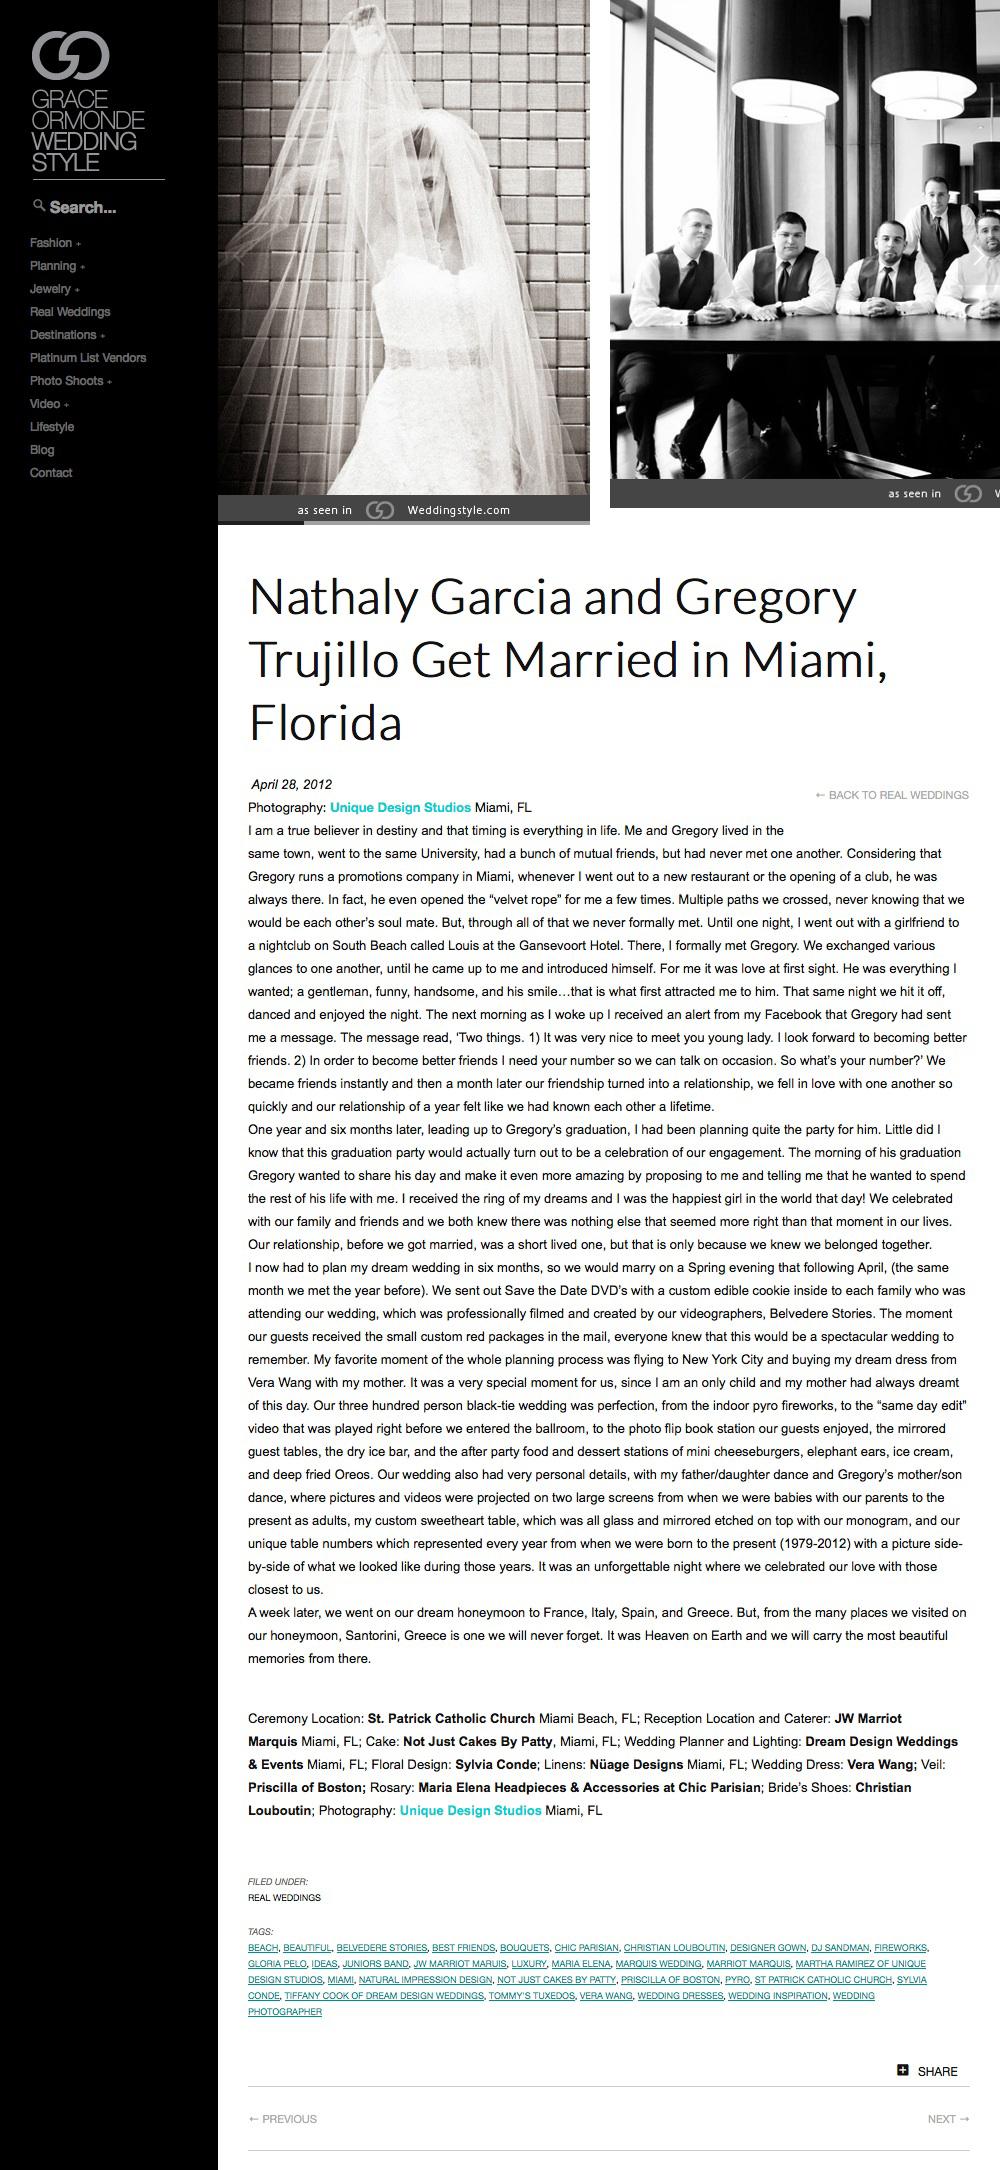 Nathaly Garcia and Gregory Trujillo | Grace Ormonde Wedding Style